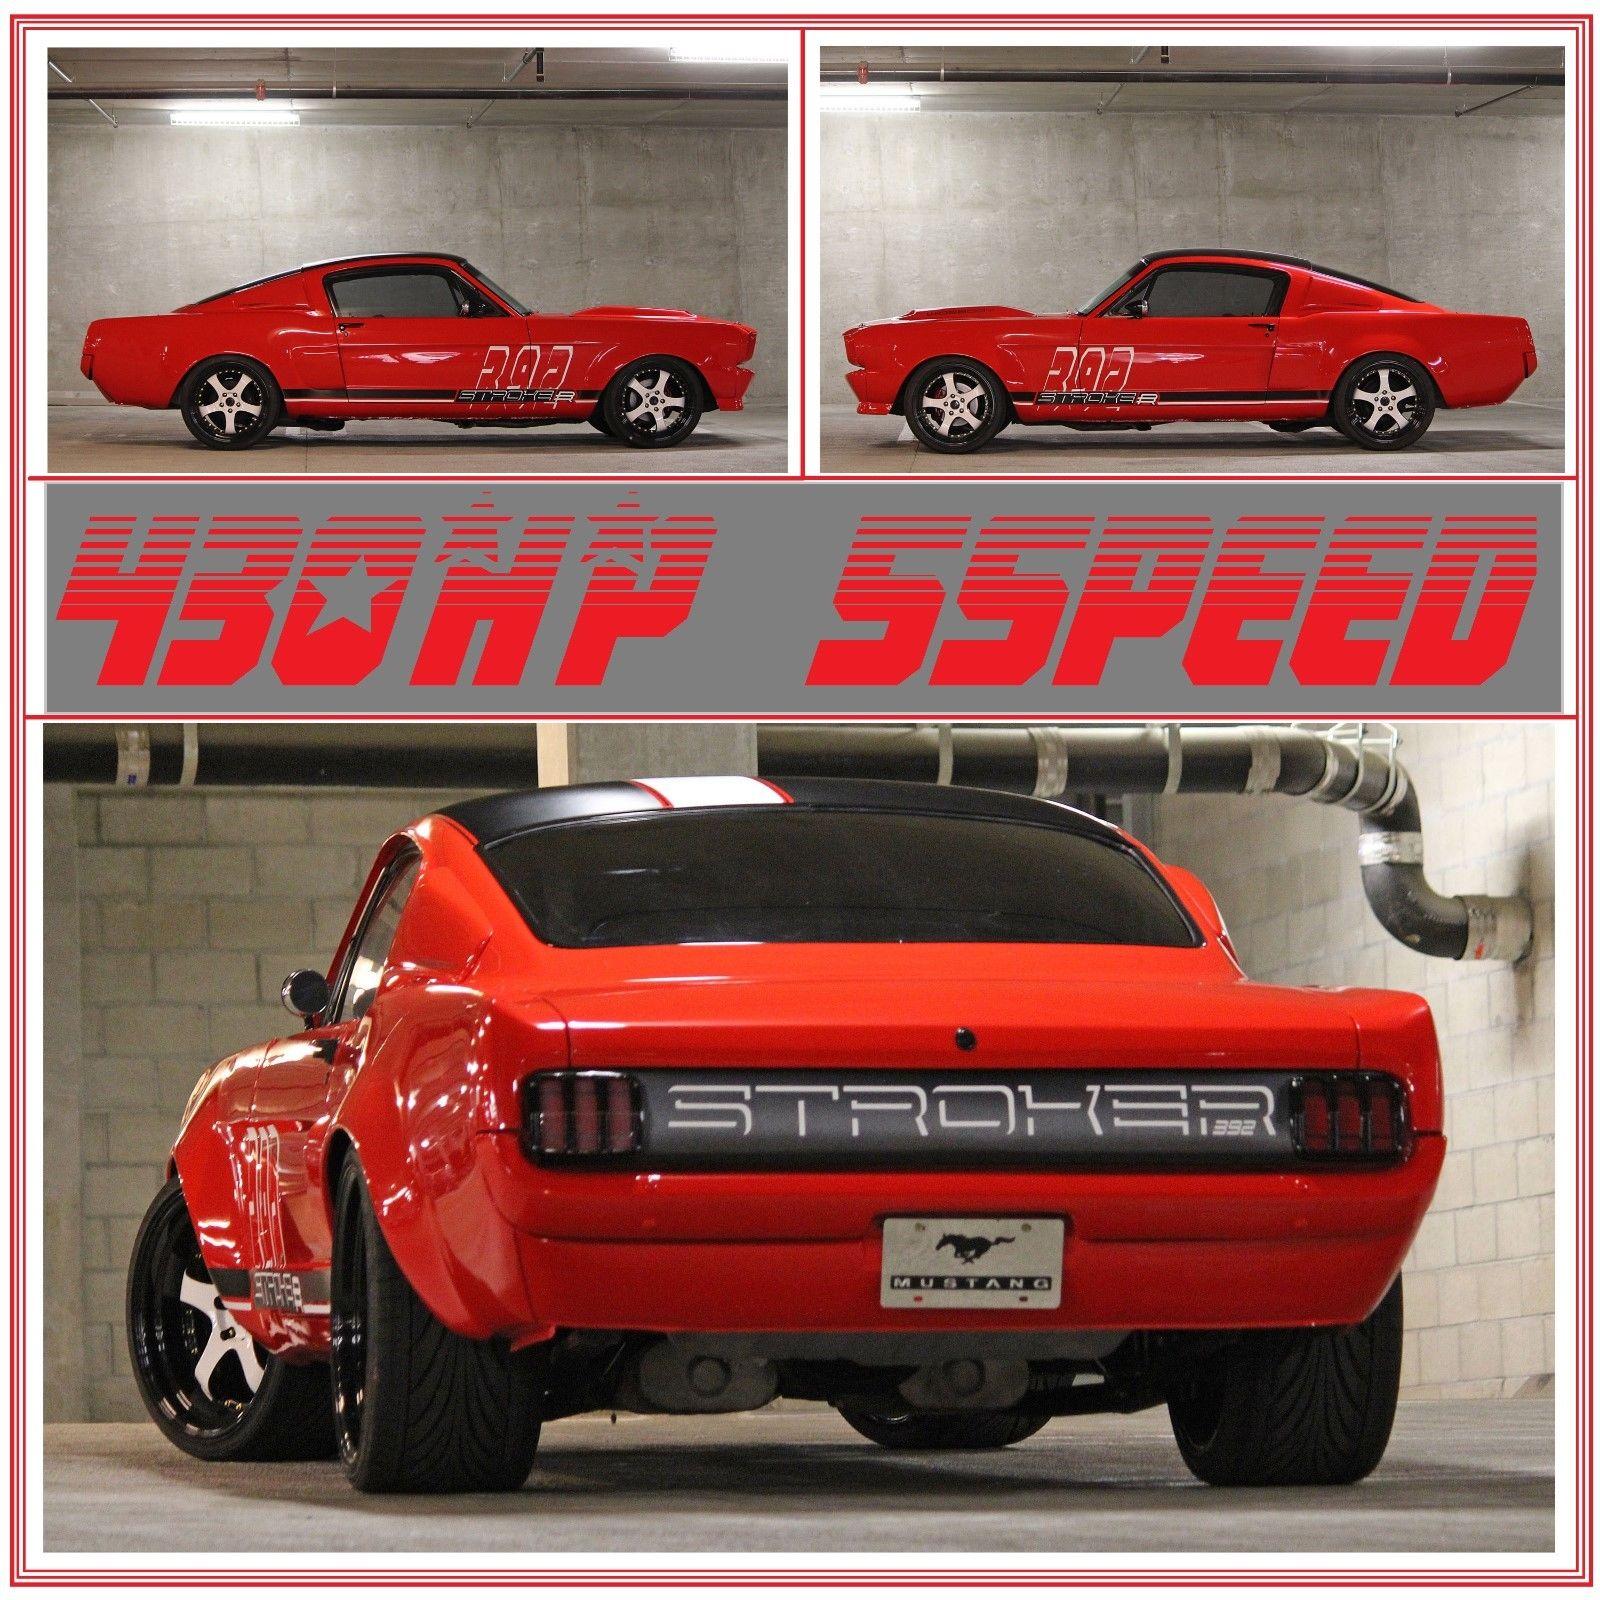 1965 Ford Mustang 1965 MUSTANG FASTBACK WIDEBODY 2019